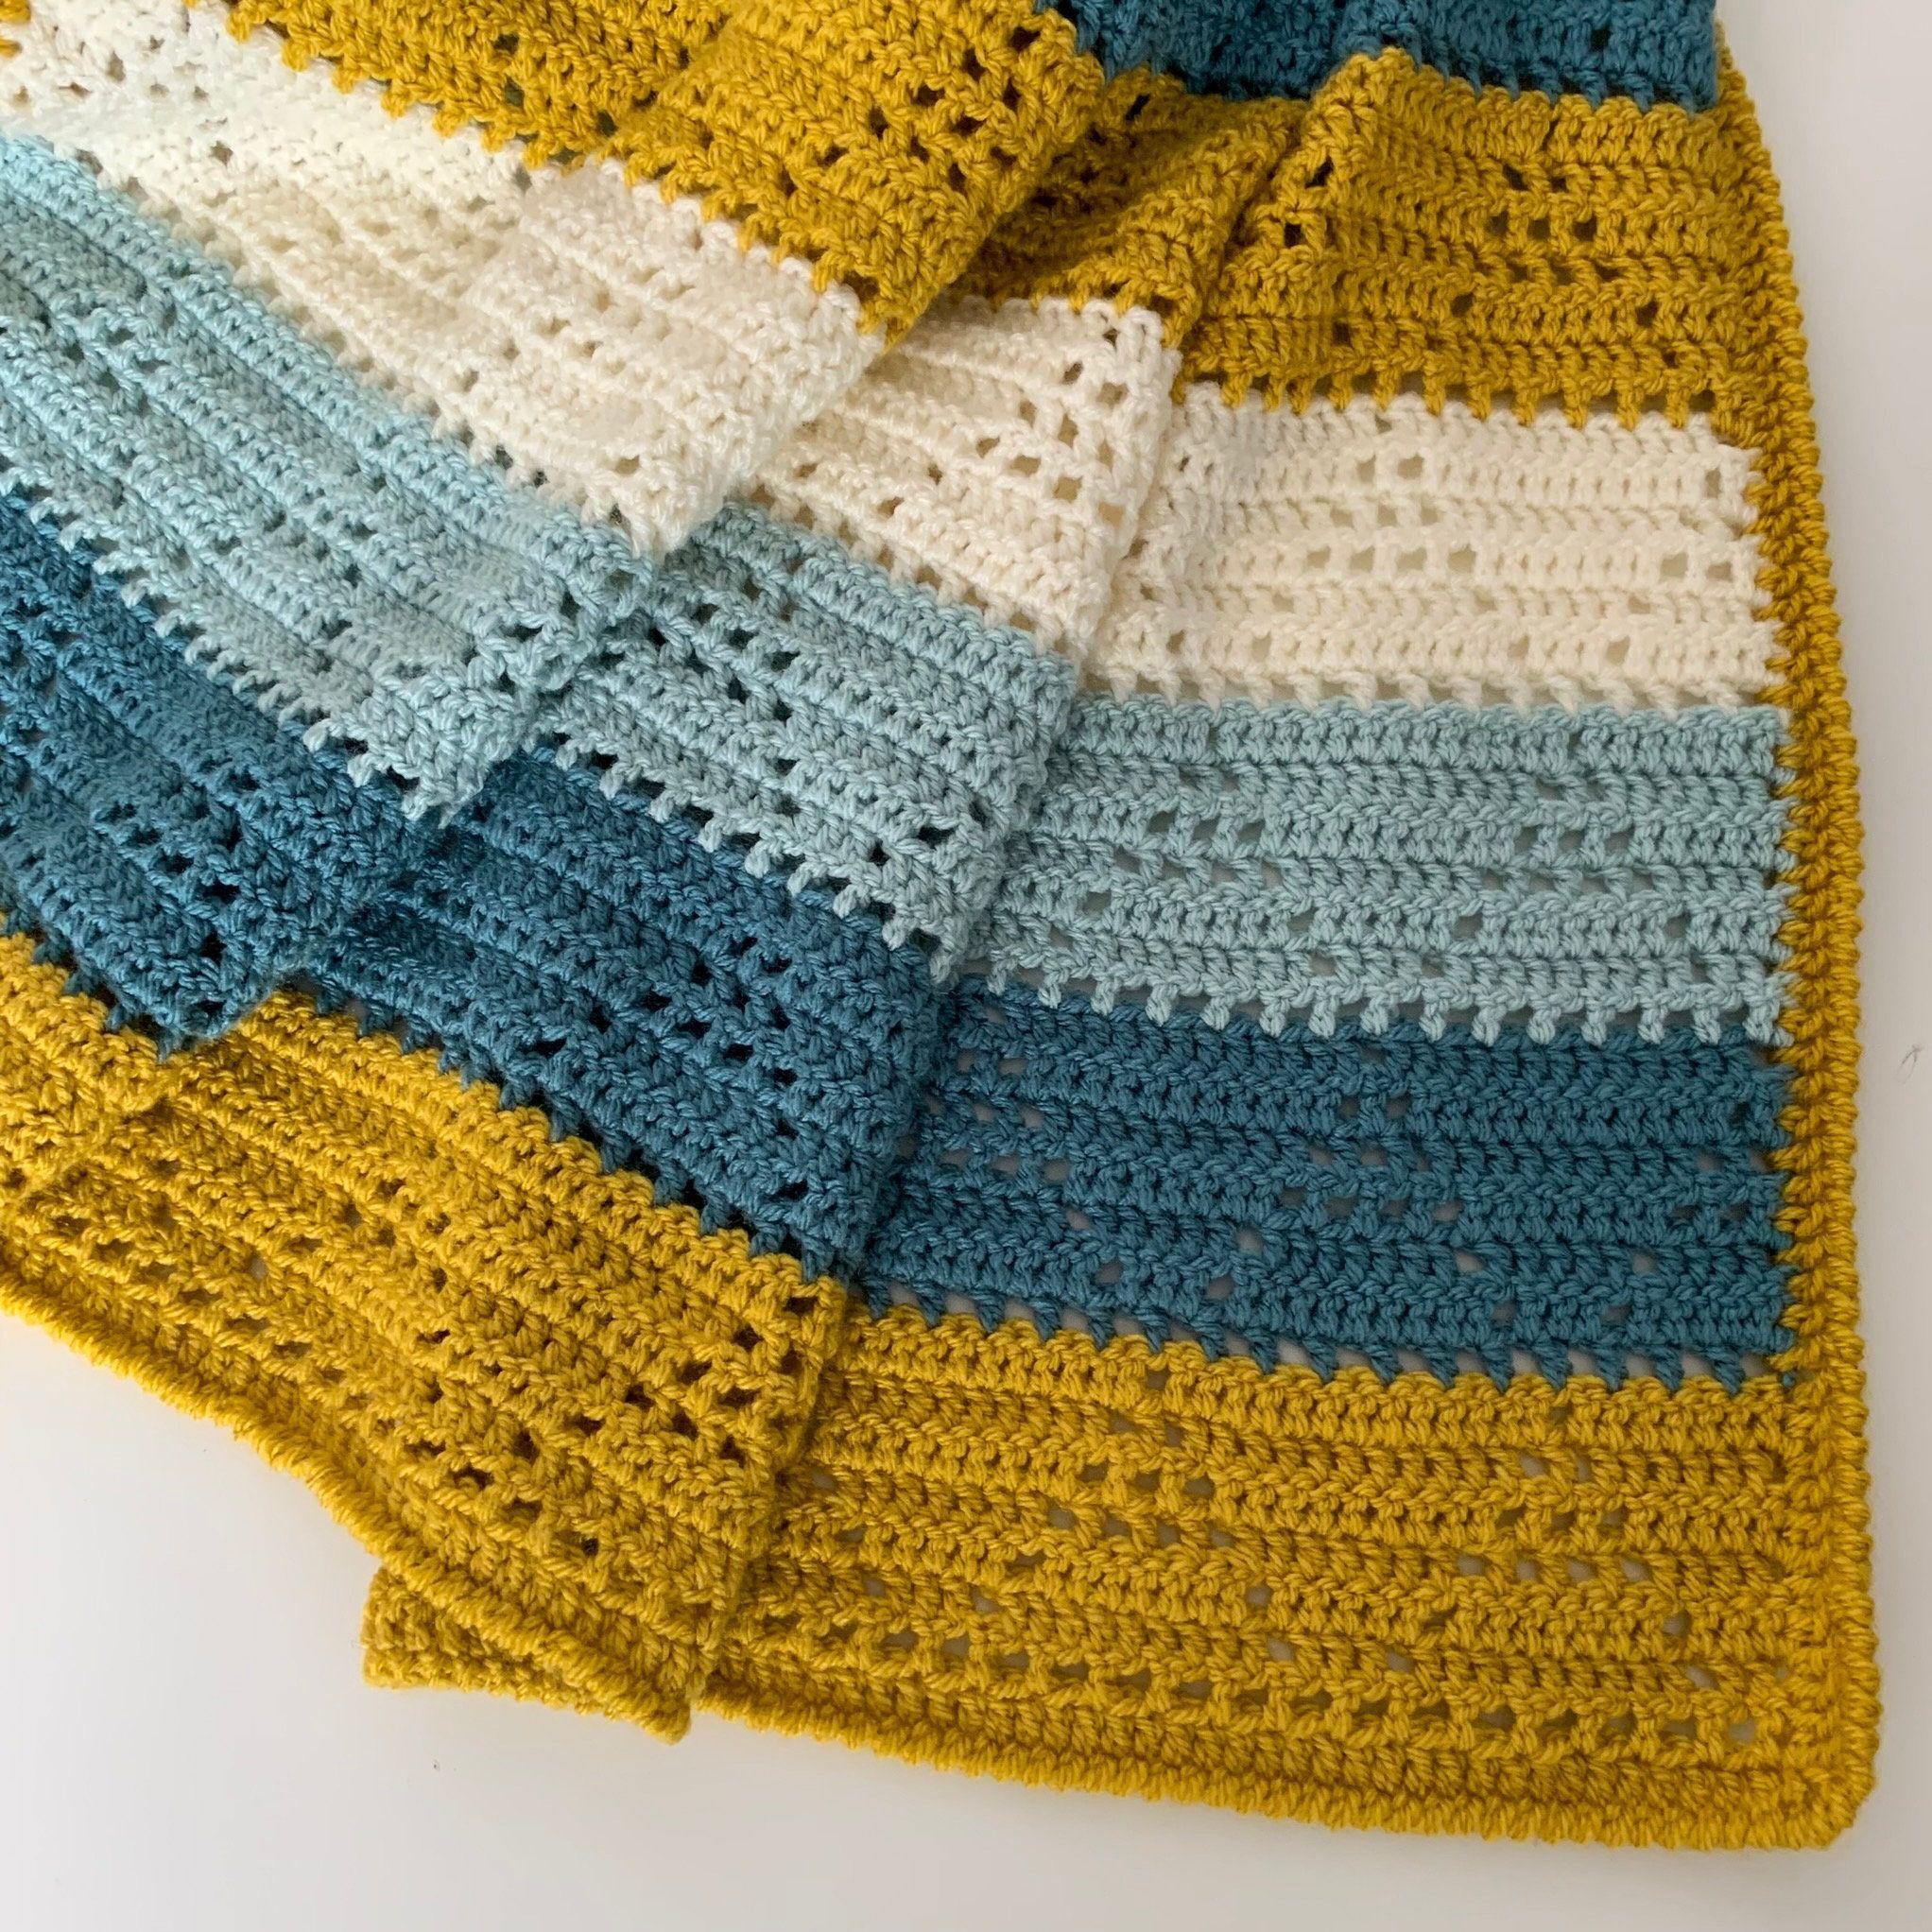 Crochet Pattern Snowy Mountains Blanket Pdf English Etsy In 2020 Crochet Blanket Colors Baby Blanket Crochet Pattern Crochet Patterns